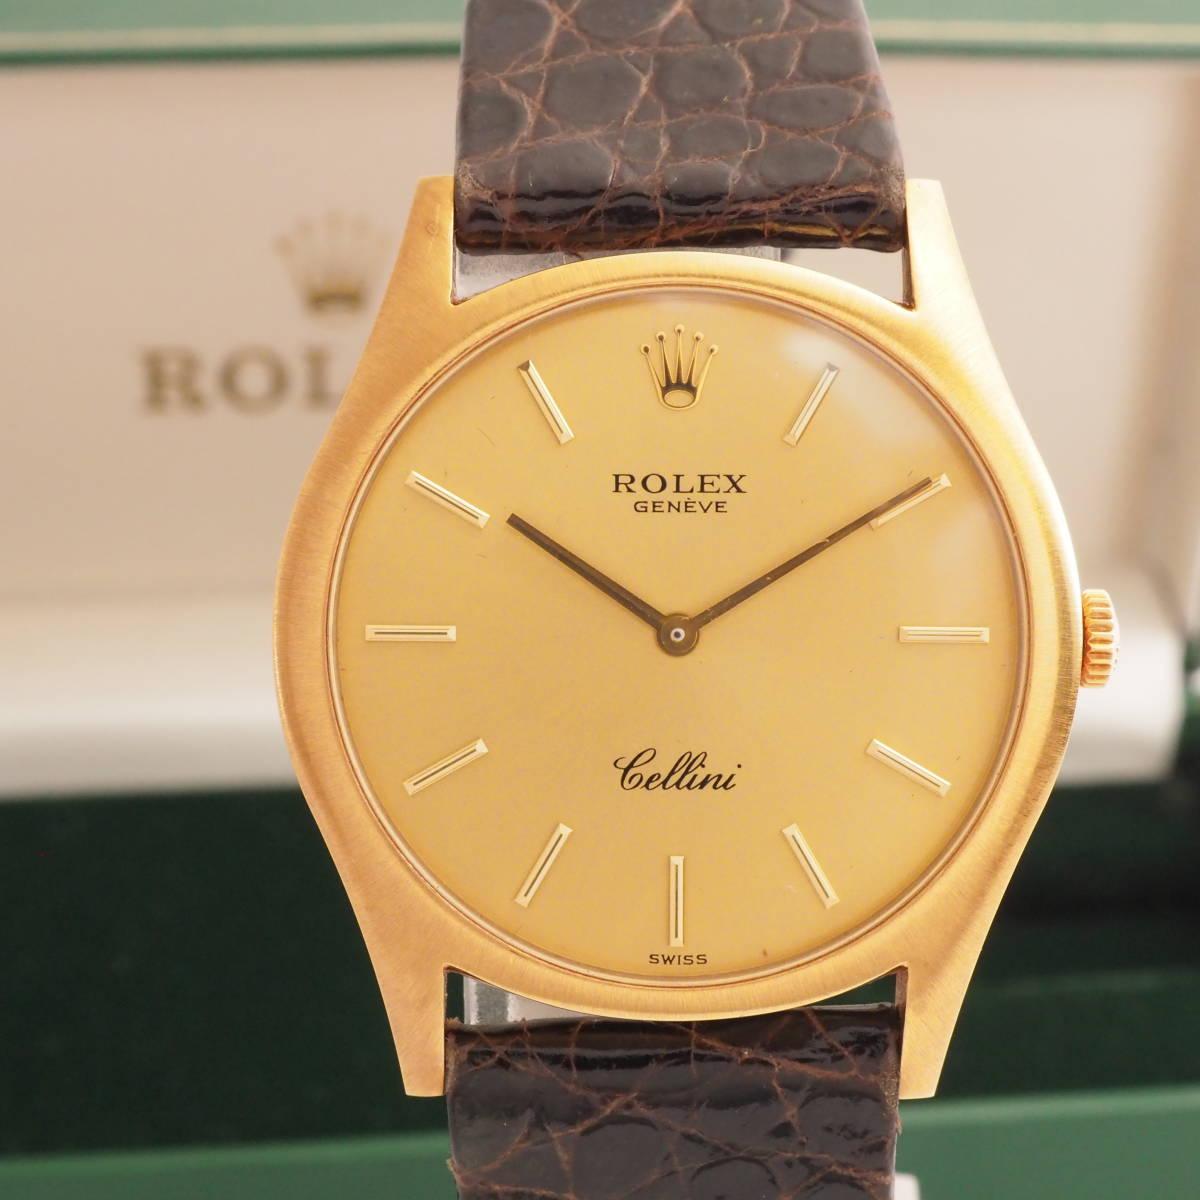 K18 金無垢 ロレックス チェリーニ Ref,3804 ROLEX Cal,1601 ビンテージ 手巻き 革ベルト メンズ 男性 腕時計 [4330271]